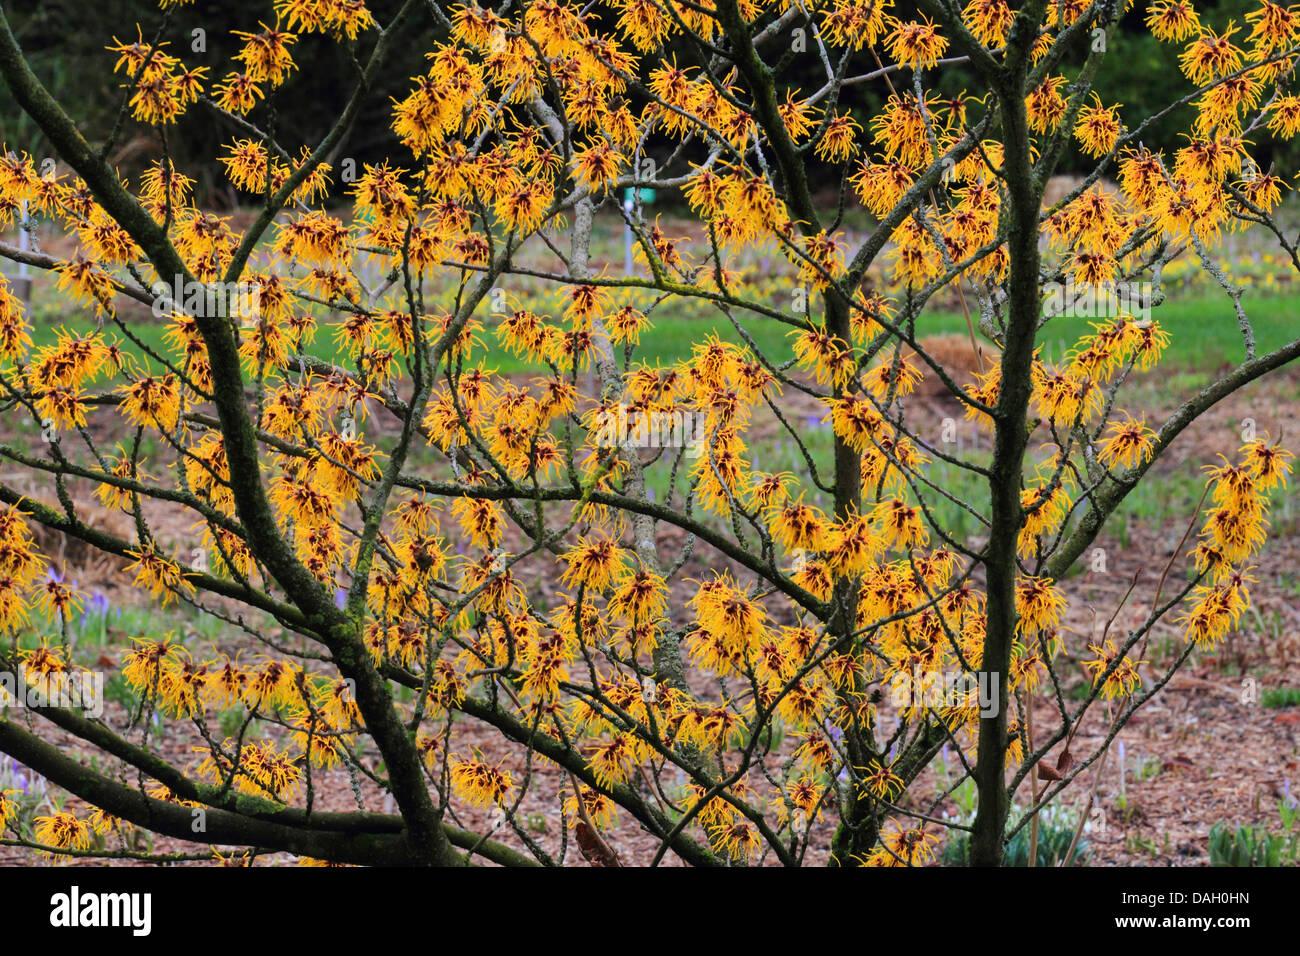 Japanese Witch Hazel Hamamelis Japonica Blooming Stock Photo